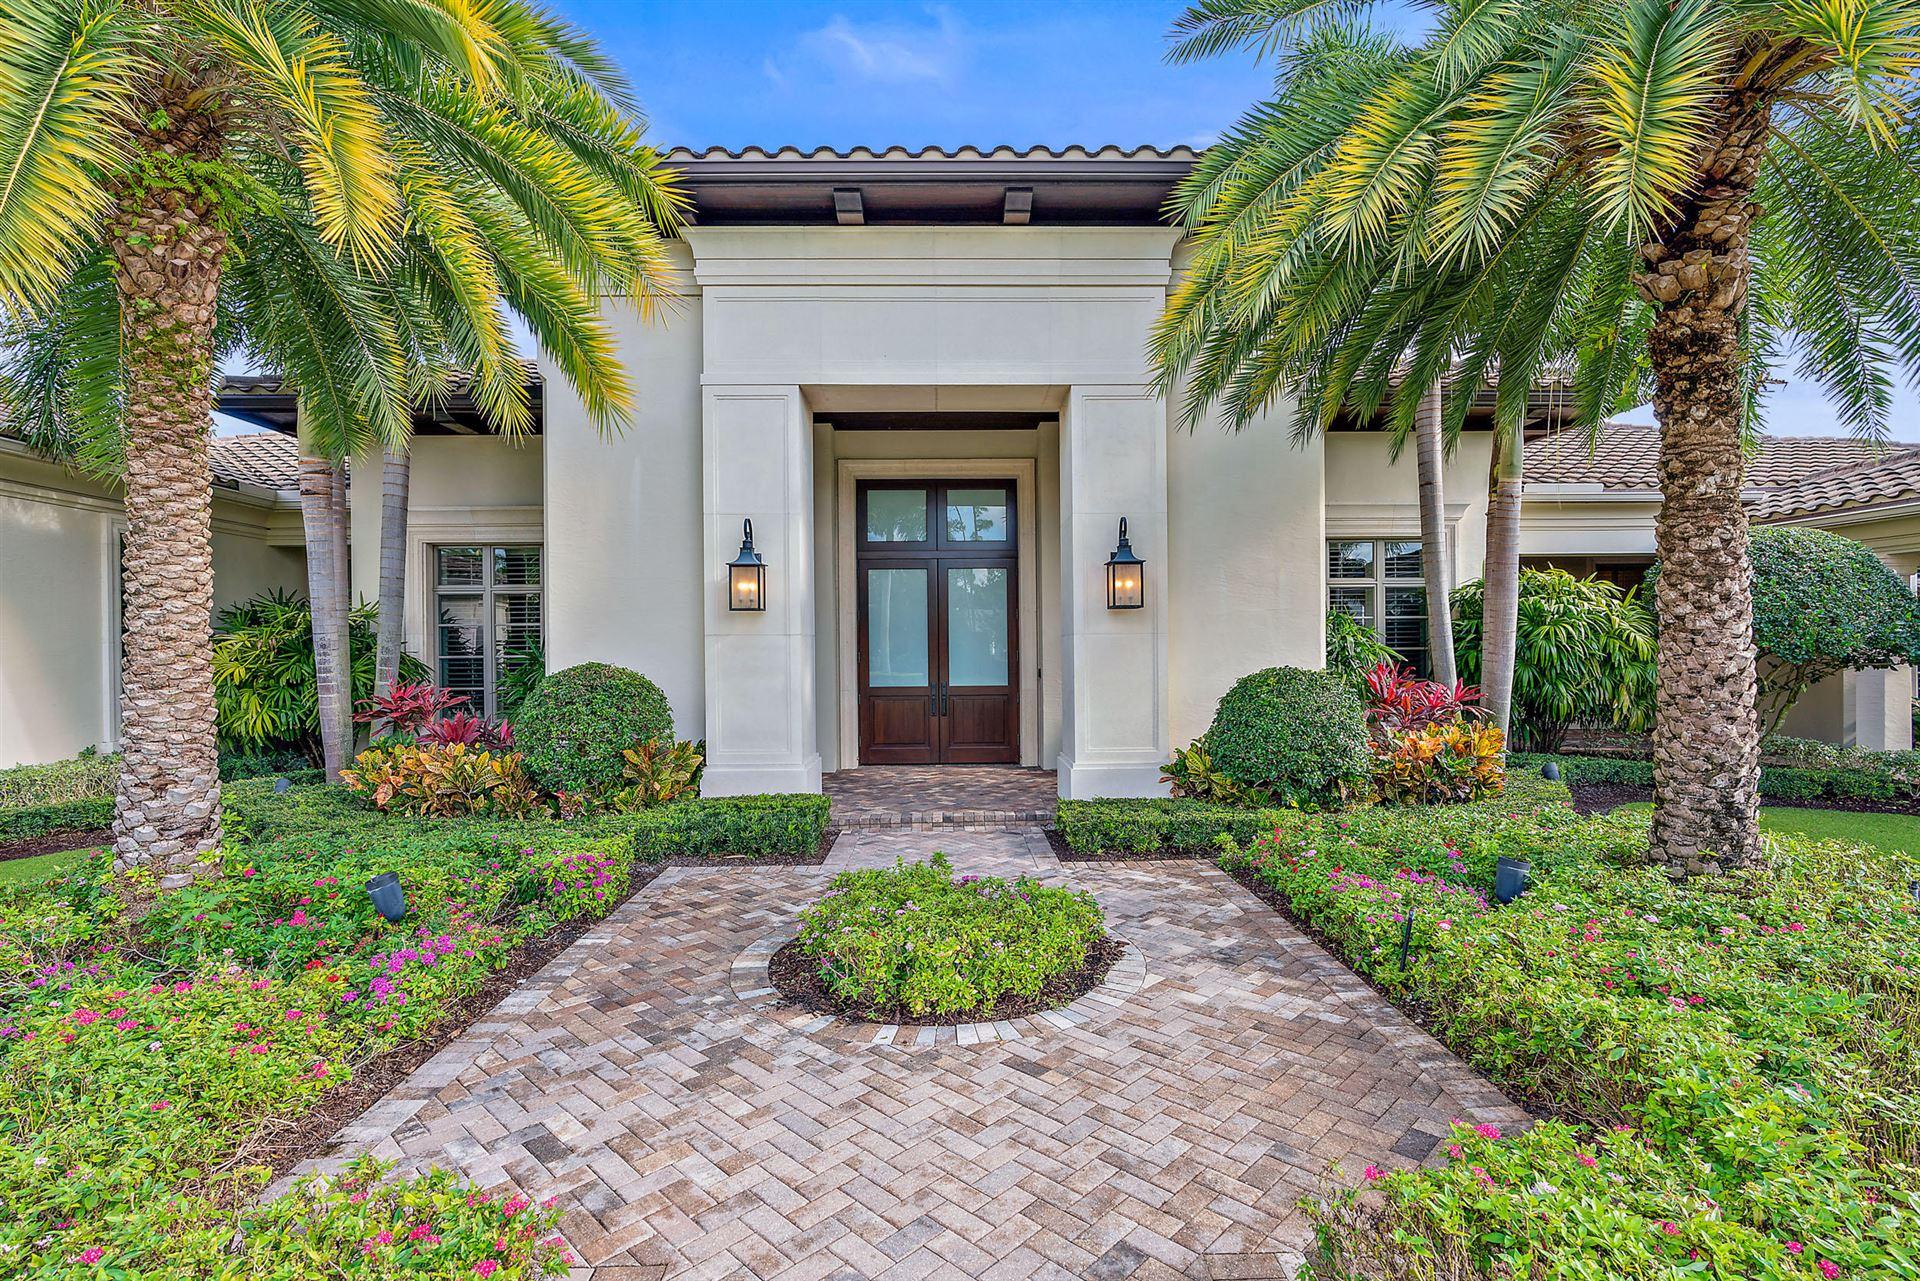 Photo of 12402 Hautree Court, Palm Beach Gardens, FL 33418 (MLS # RX-10654928)